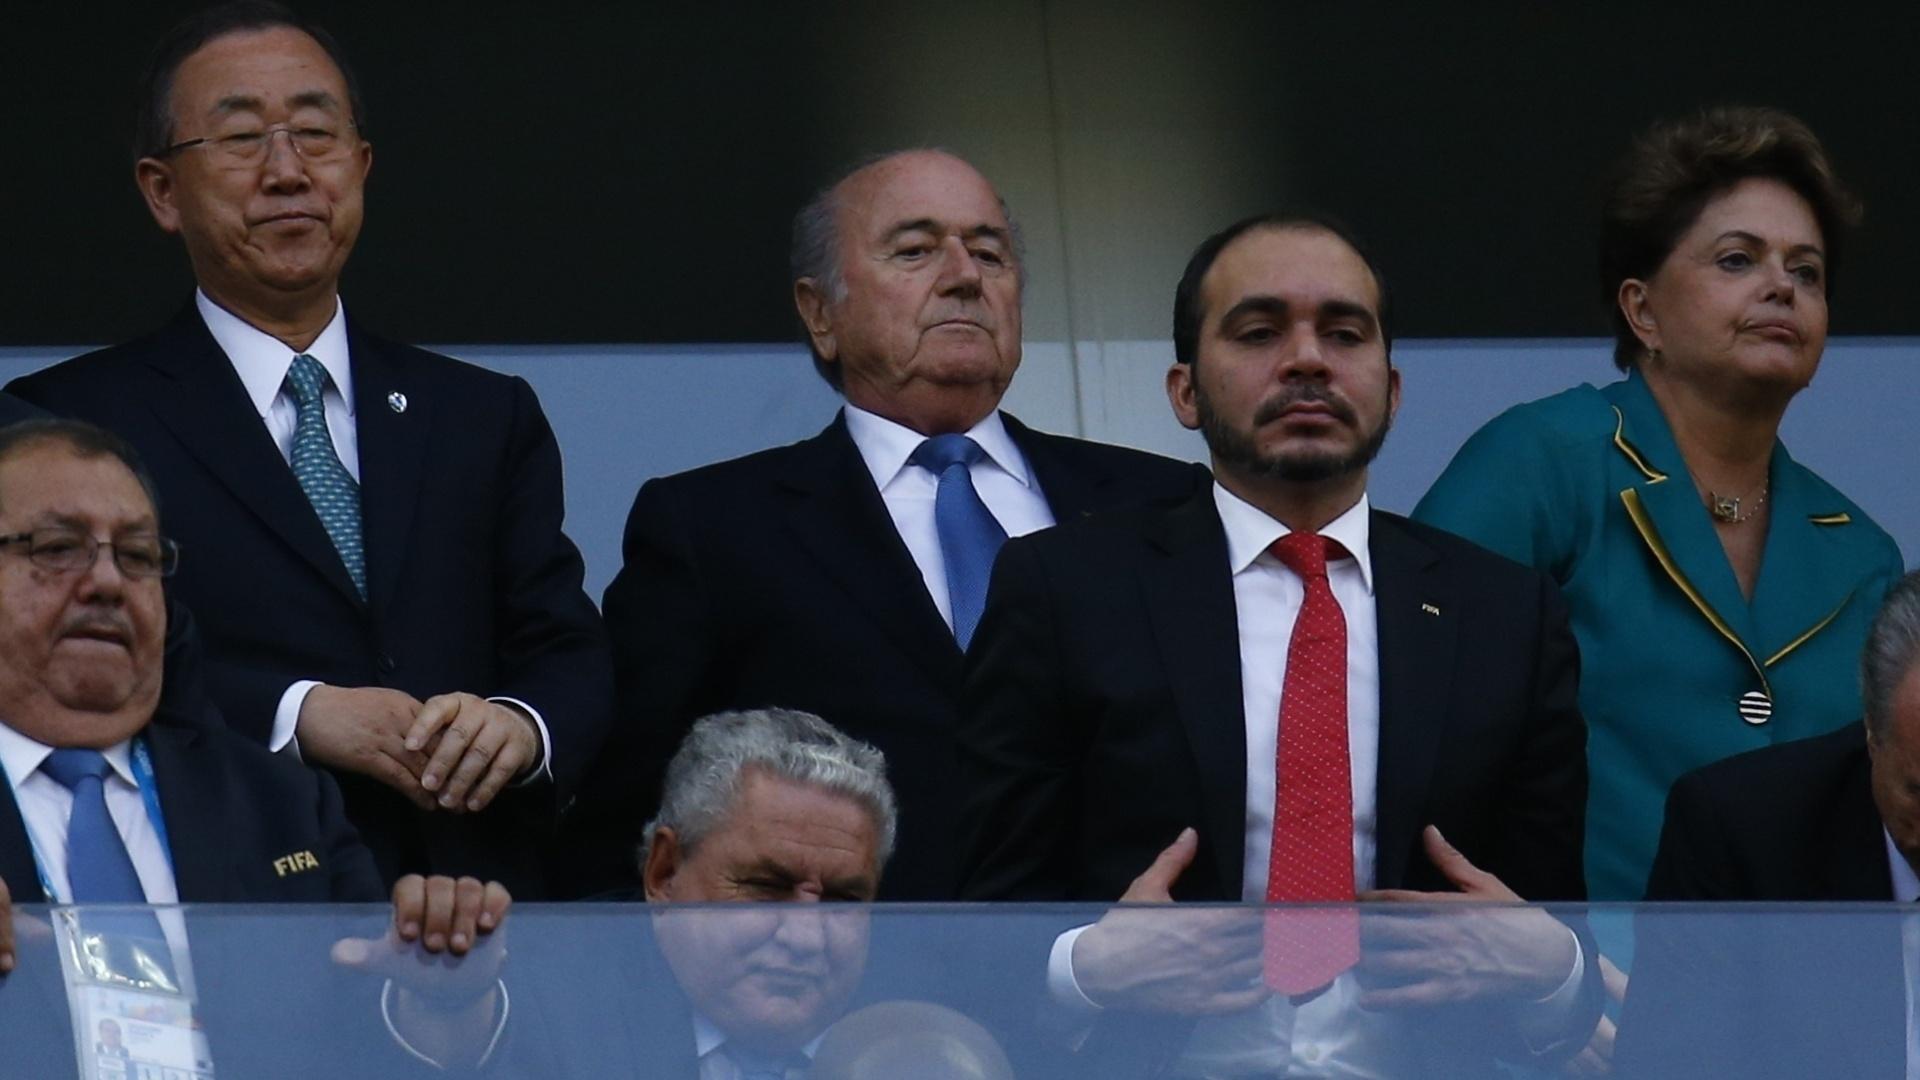 12.jun.2014 - Secretário-geral das Nações Unidas Ban Ki-moon, Joseph Blatter e Dilma Rouseff antes da partida entre Brasil e Croácia